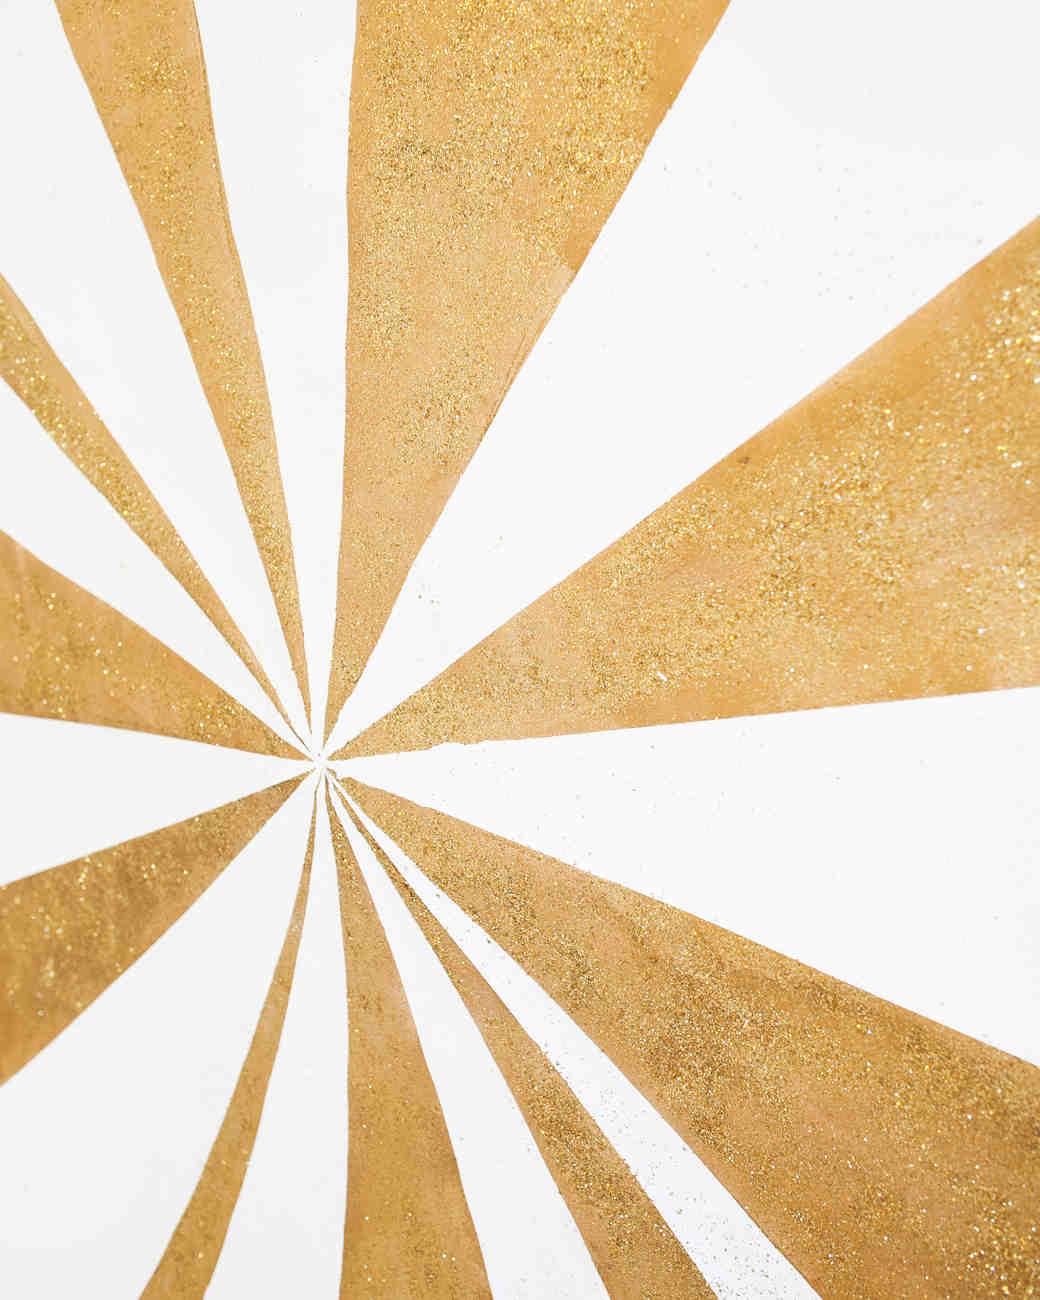 gold-burst-image-51-mwds111113.jpg